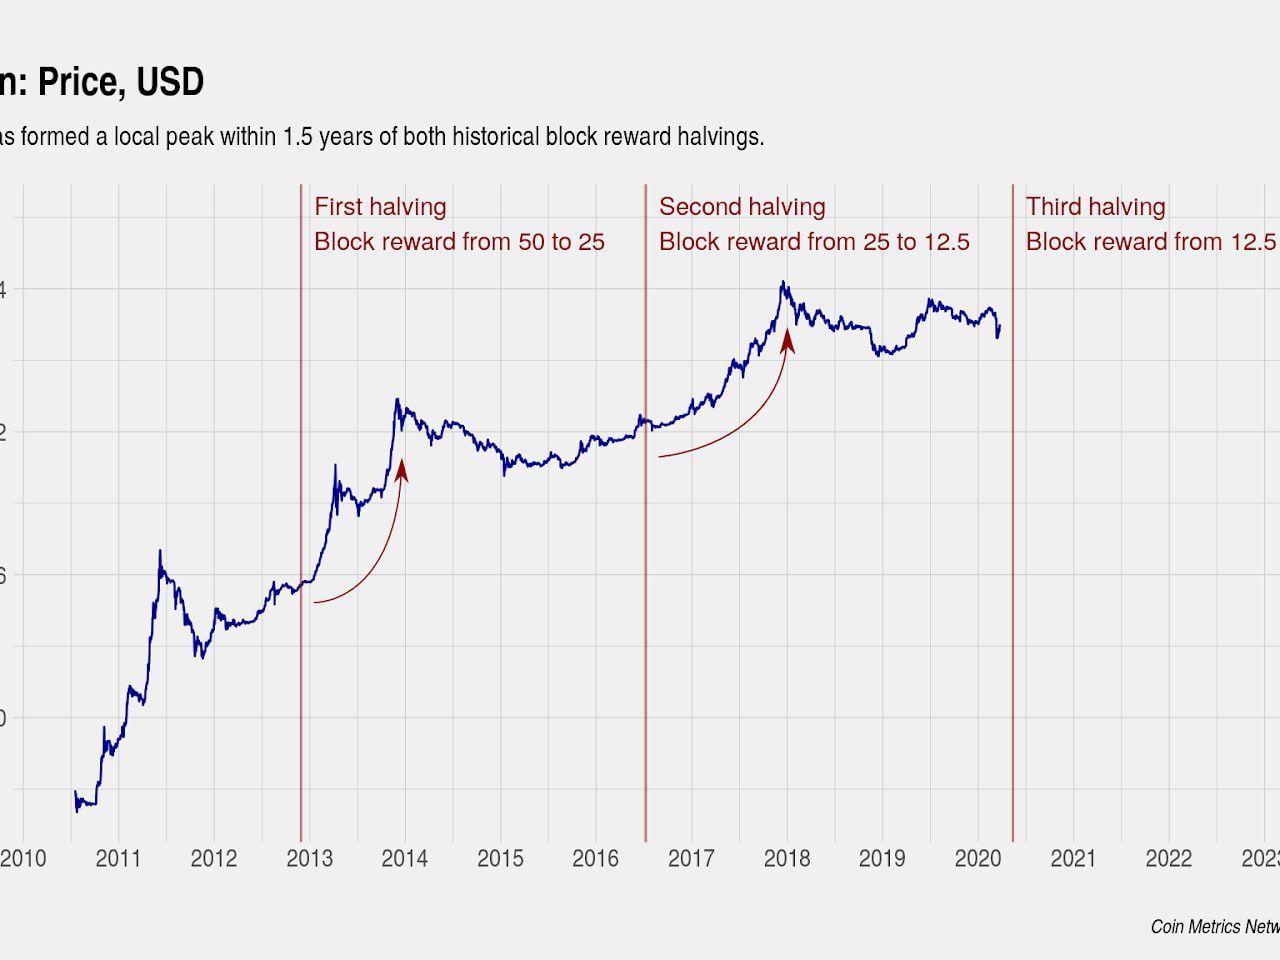 BTC/USD árfolyam (Bitcoin árfolyam) - Árfolyamok - Pénzcentrum